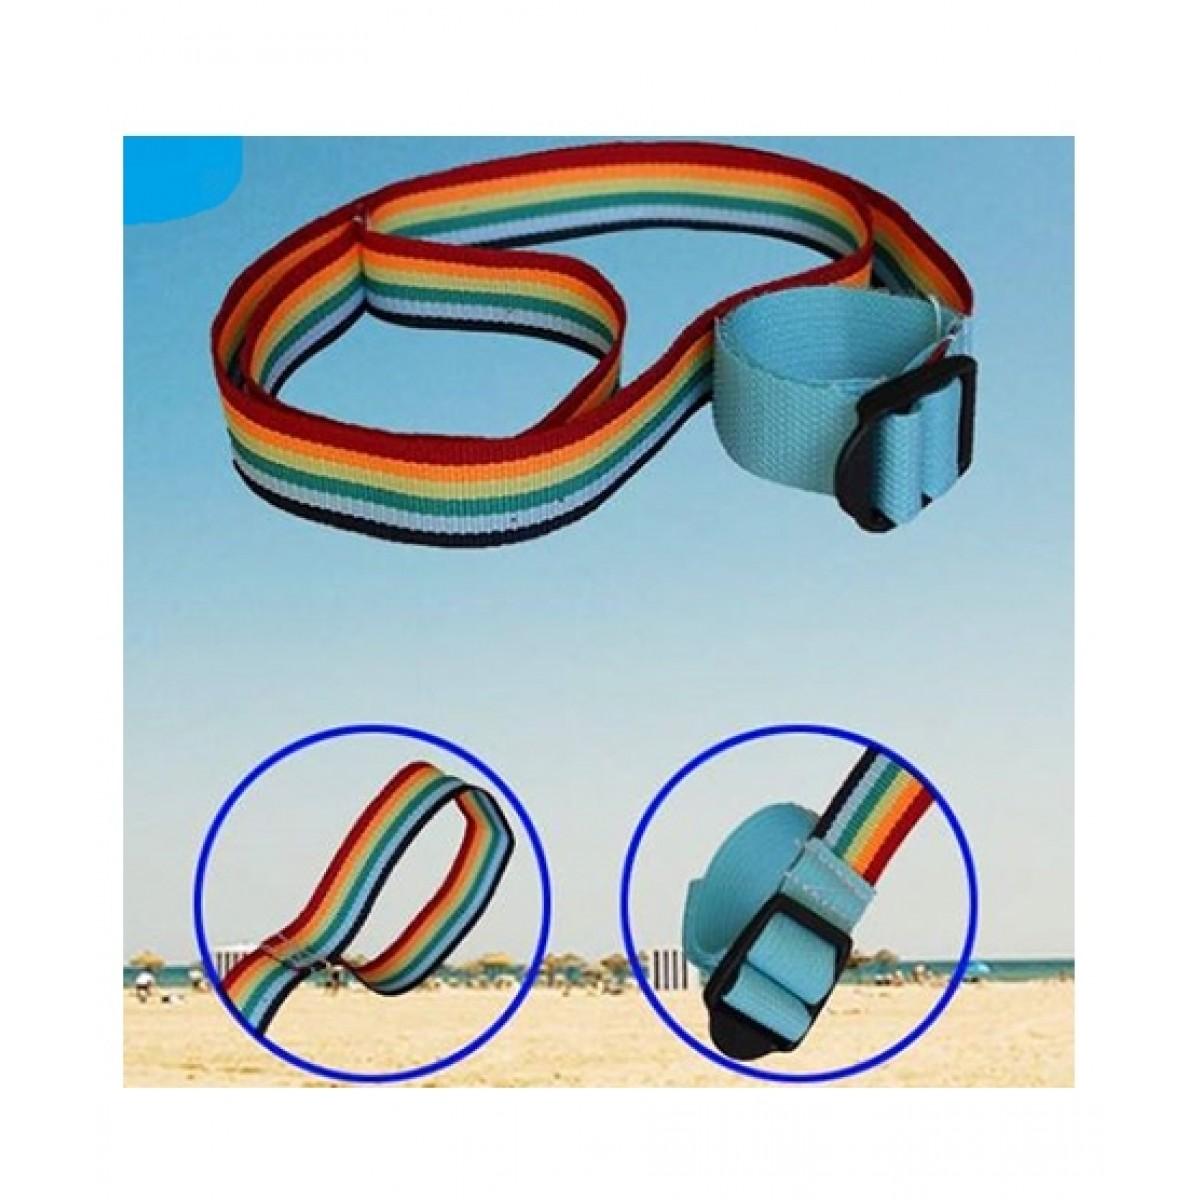 Proxymedia Anti-Lost Wrist Safety Strap (0121)